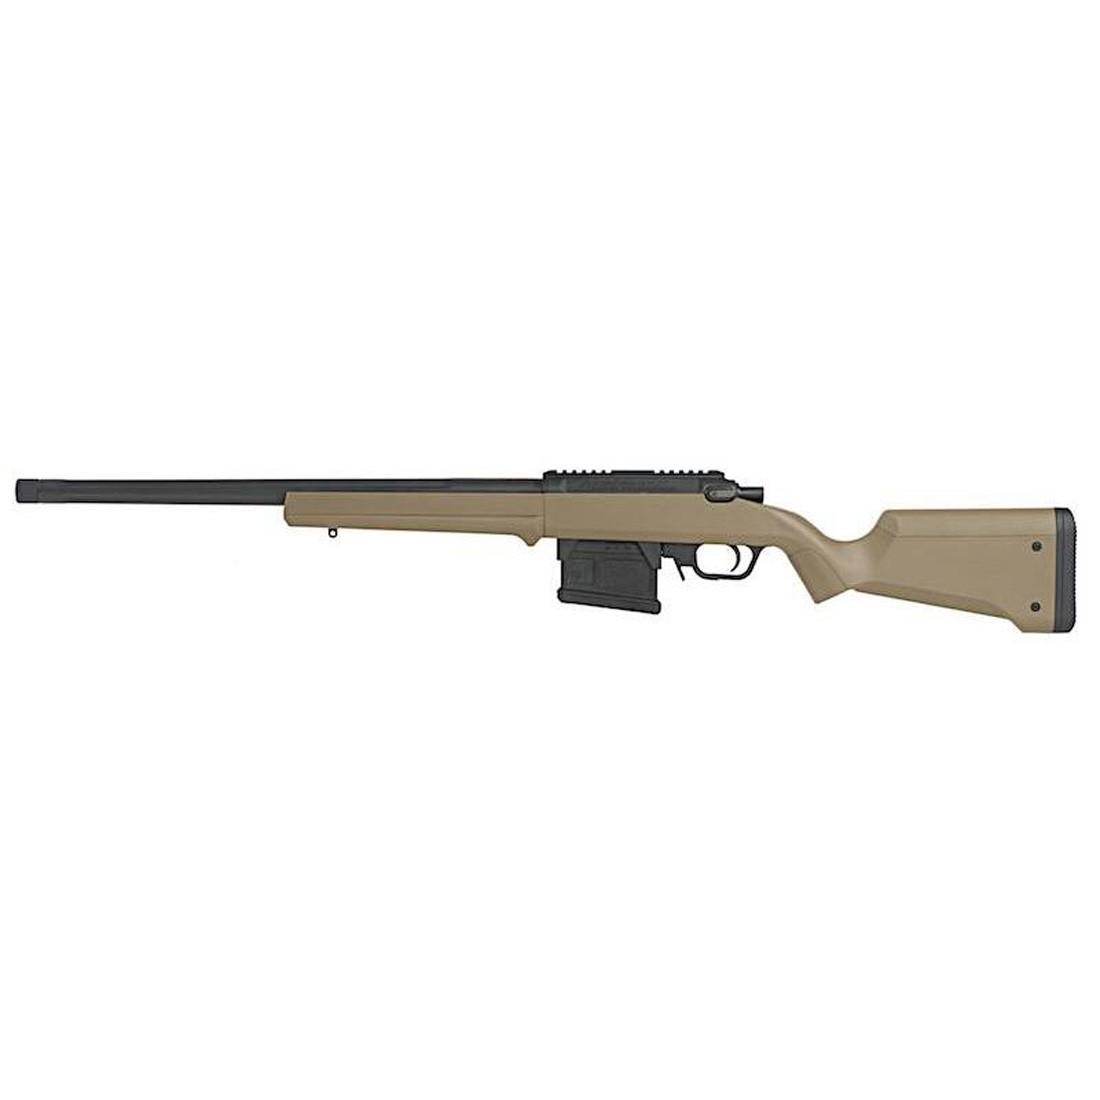 Ares Amoeba Striker Spring Sniper Rifle - TAN/FDE